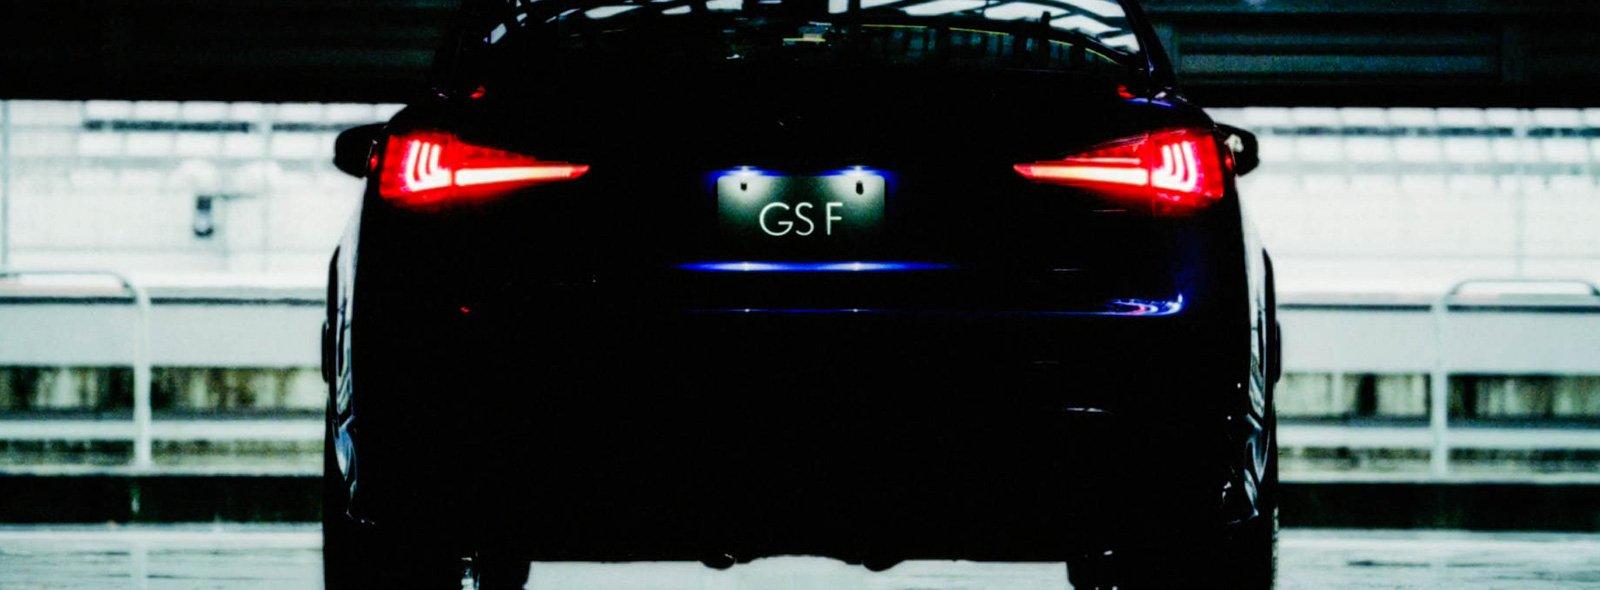 Video del modelo Sport en un plano trasero del coche